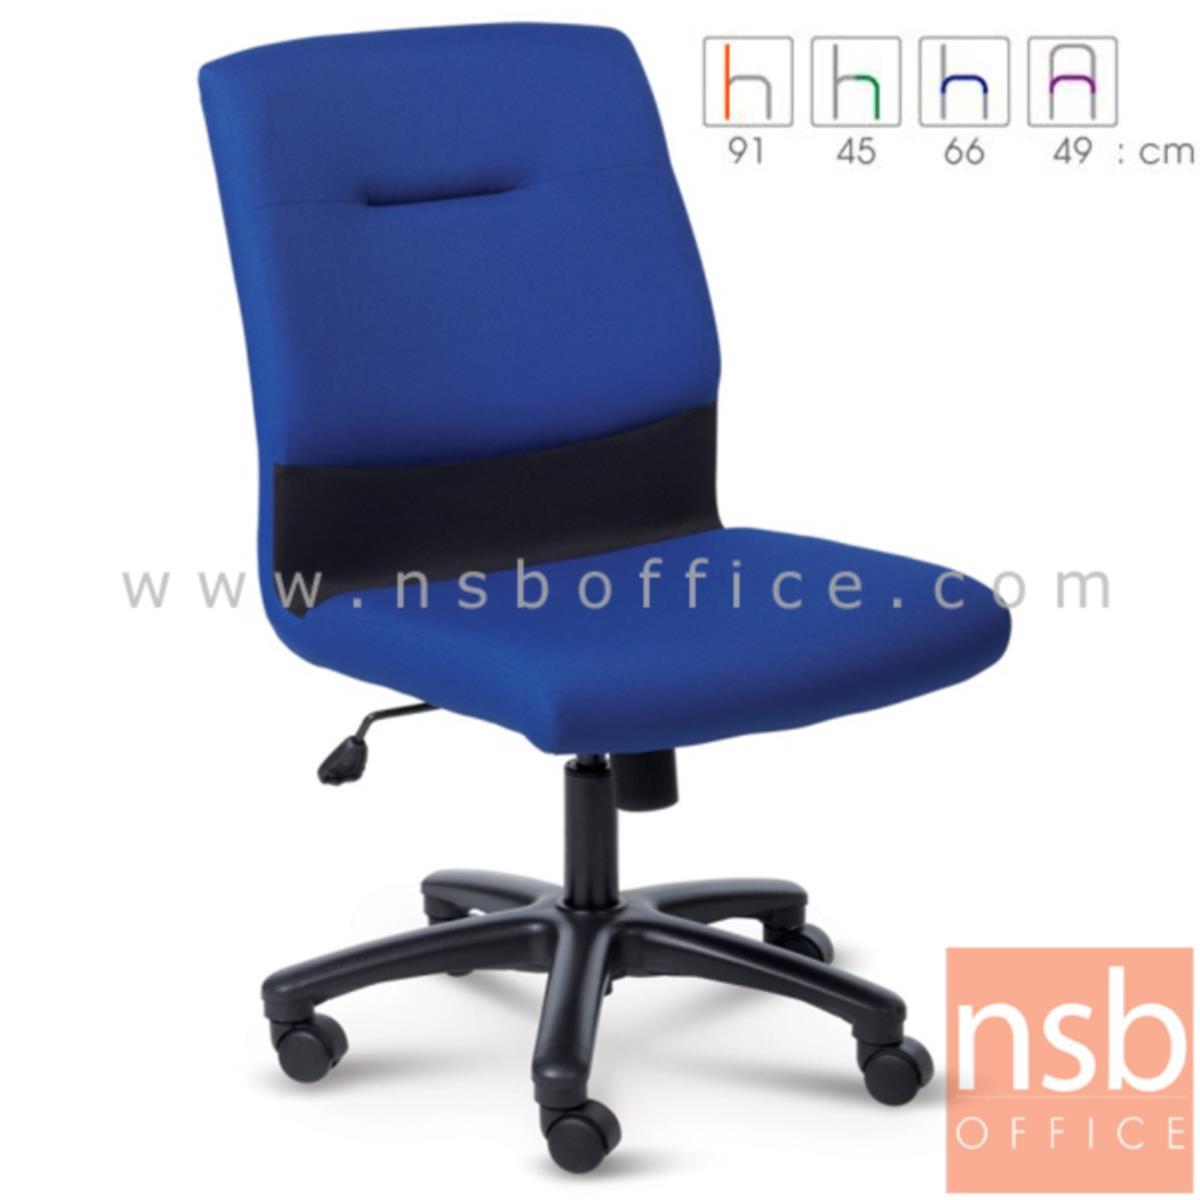 B03A424:เก้าอี้สำนักงาน รุ่น Potting (พอตติ้ง)  โช๊คแก๊ส มีก้อนโยก ขาพลาสติก